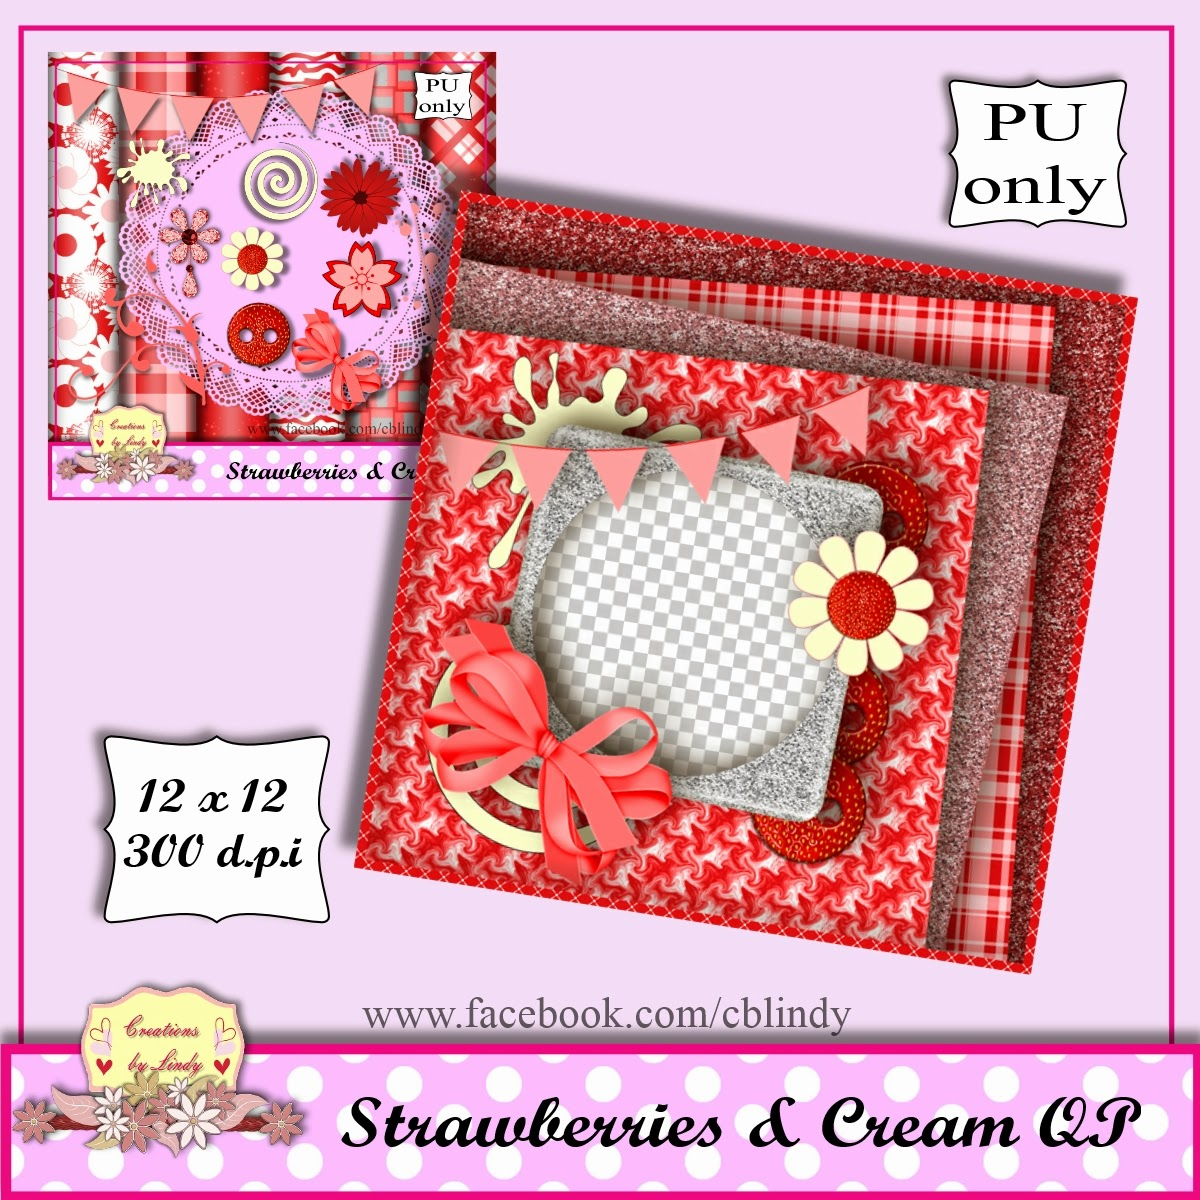 http://3.bp.blogspot.com/-Dov_FwB8khA/U_ruhcOYSDI/AAAAAAAAAU0/0Zs6j6JdpXI/s1600/CBL_strawberries%26cream_qp.jpg